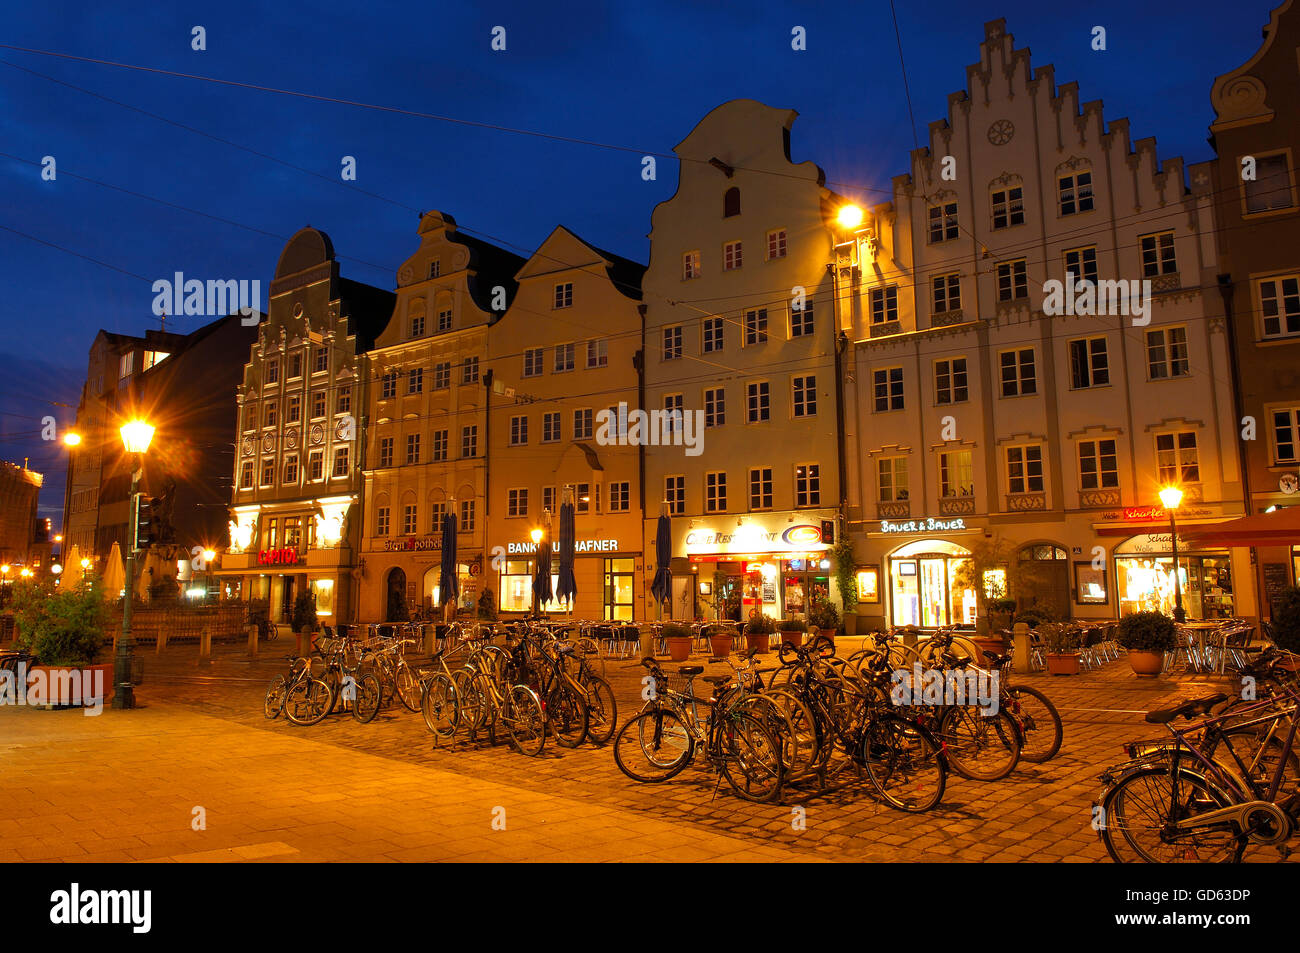 Augsburg, Maximilianstrasse, Maximilian street, Romantic Road, Romantische Strasse, Swabia, Bavaria, Germany, Europe - Stock Image